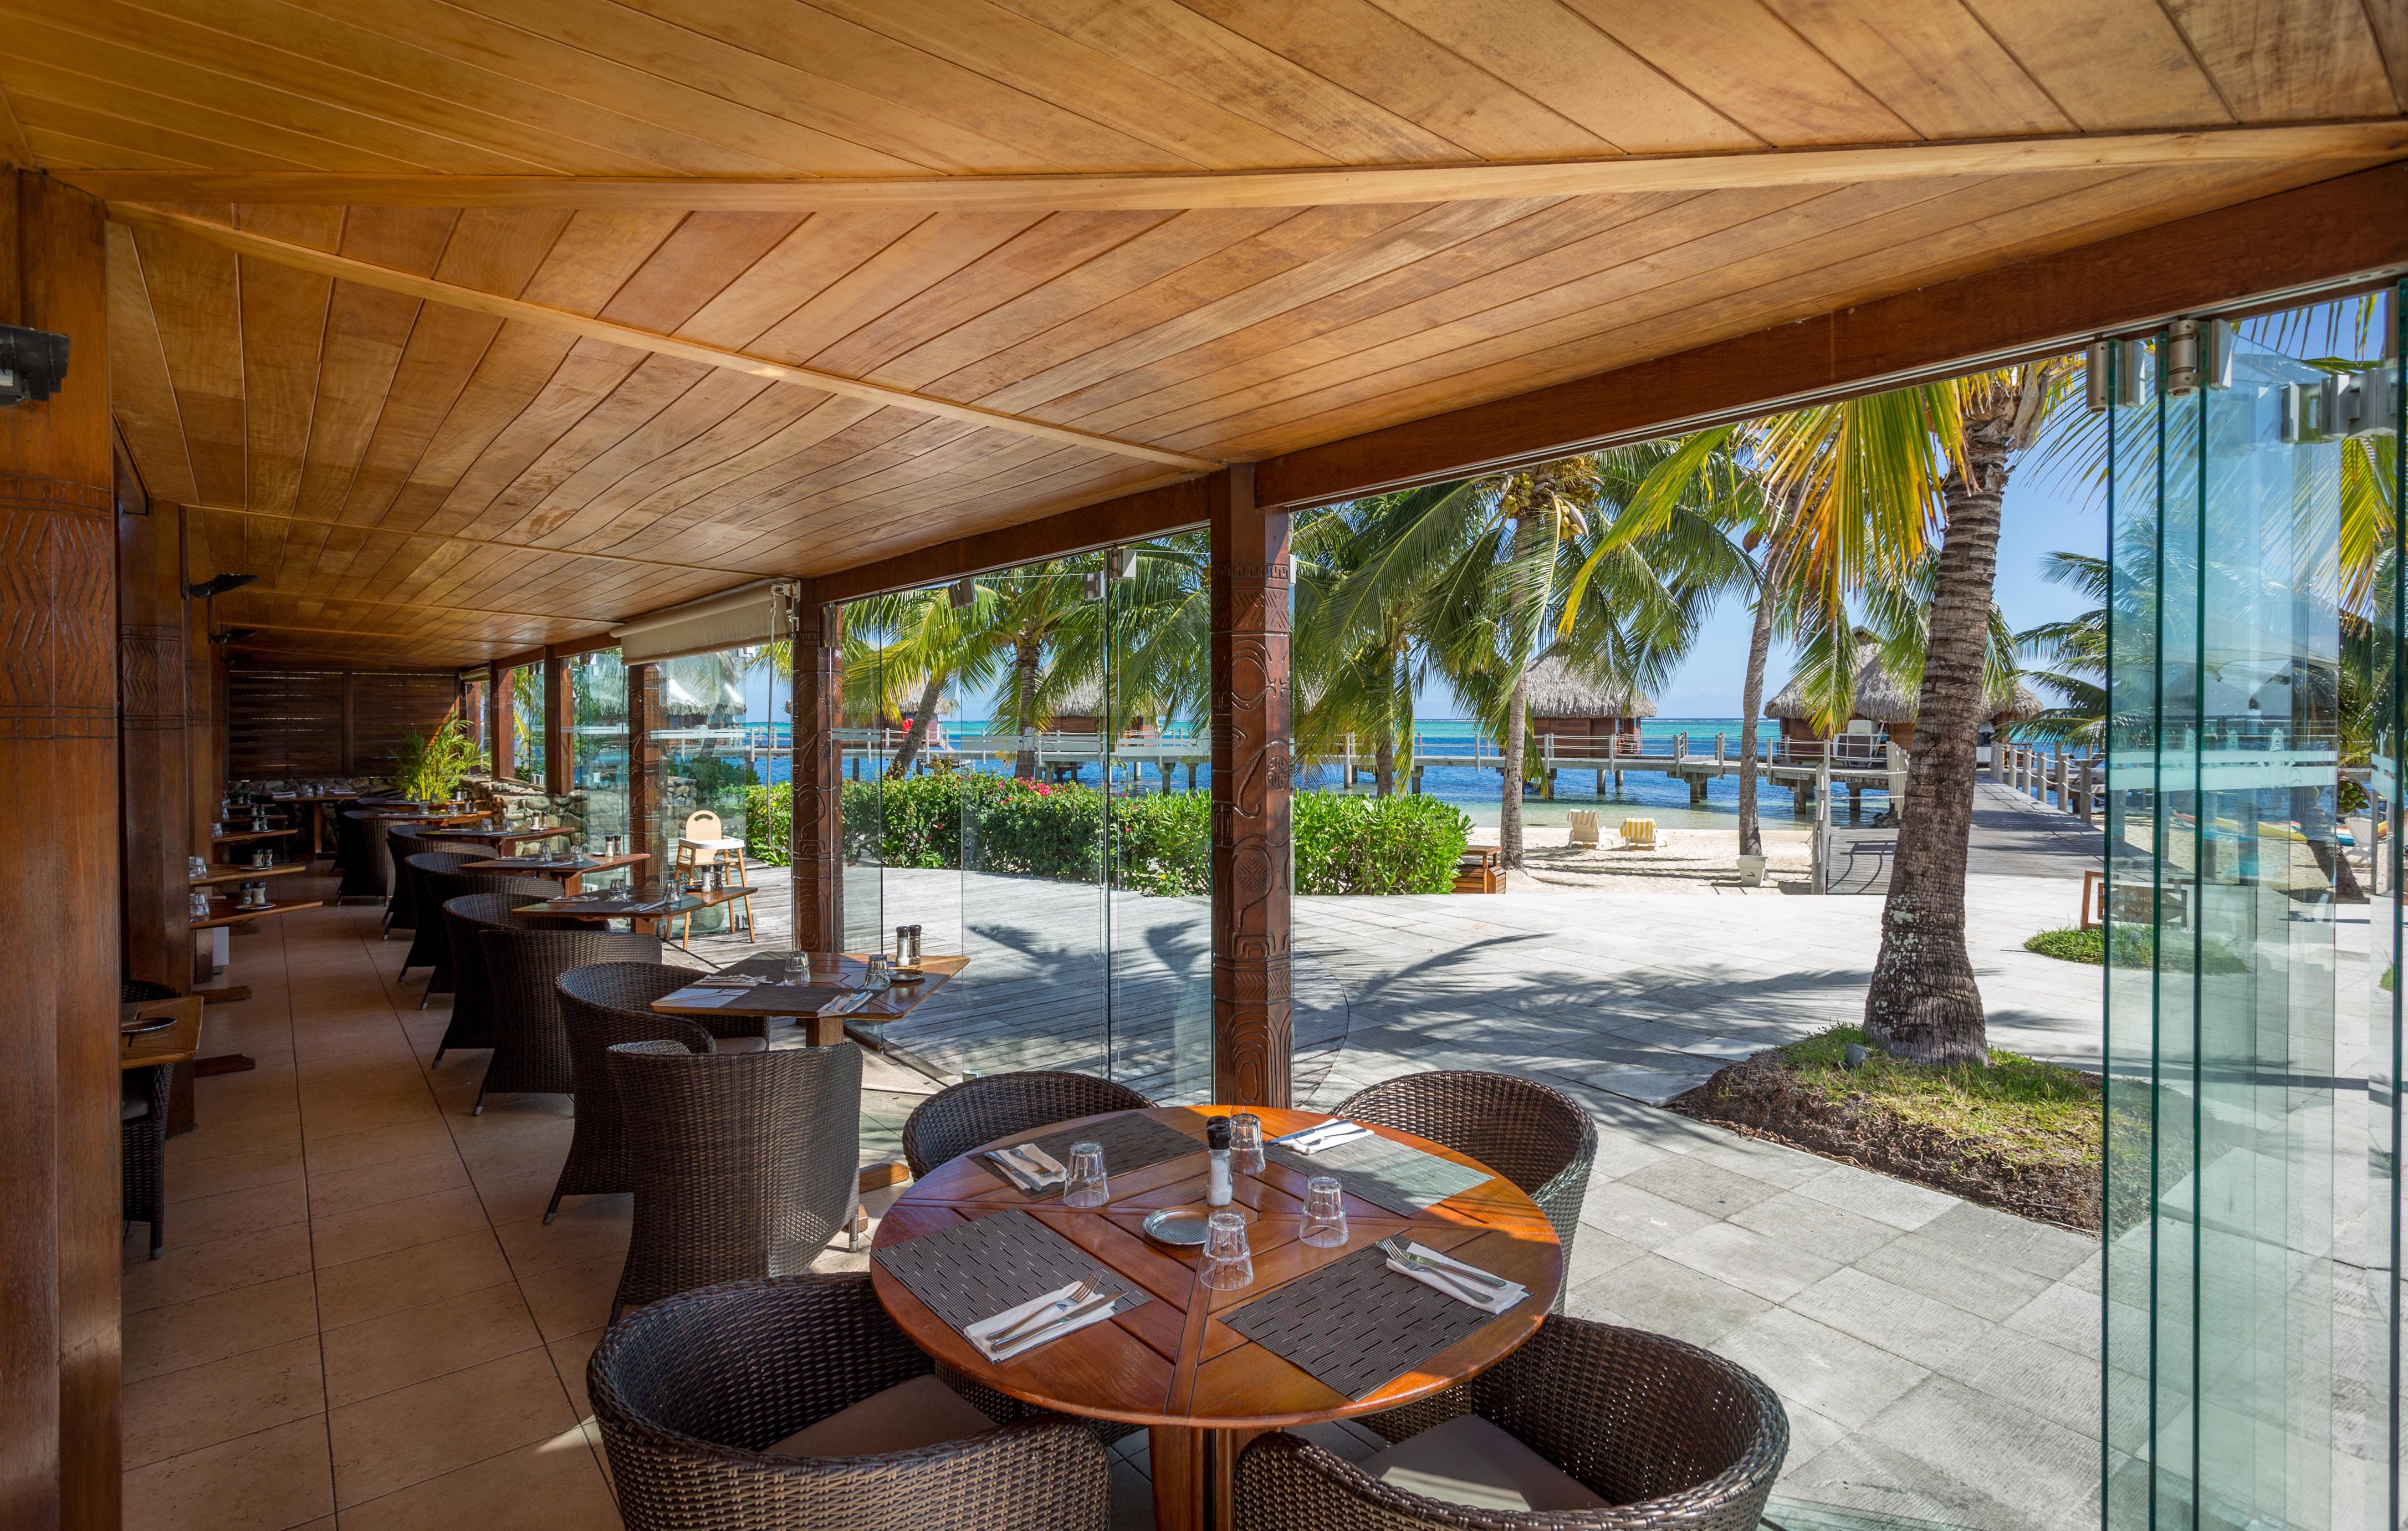 https://tahititourisme.mx/wp-content/uploads/2018/03/RESTAURATION-Restaurant-Mahanai-1-Charles_Veronese.jpg